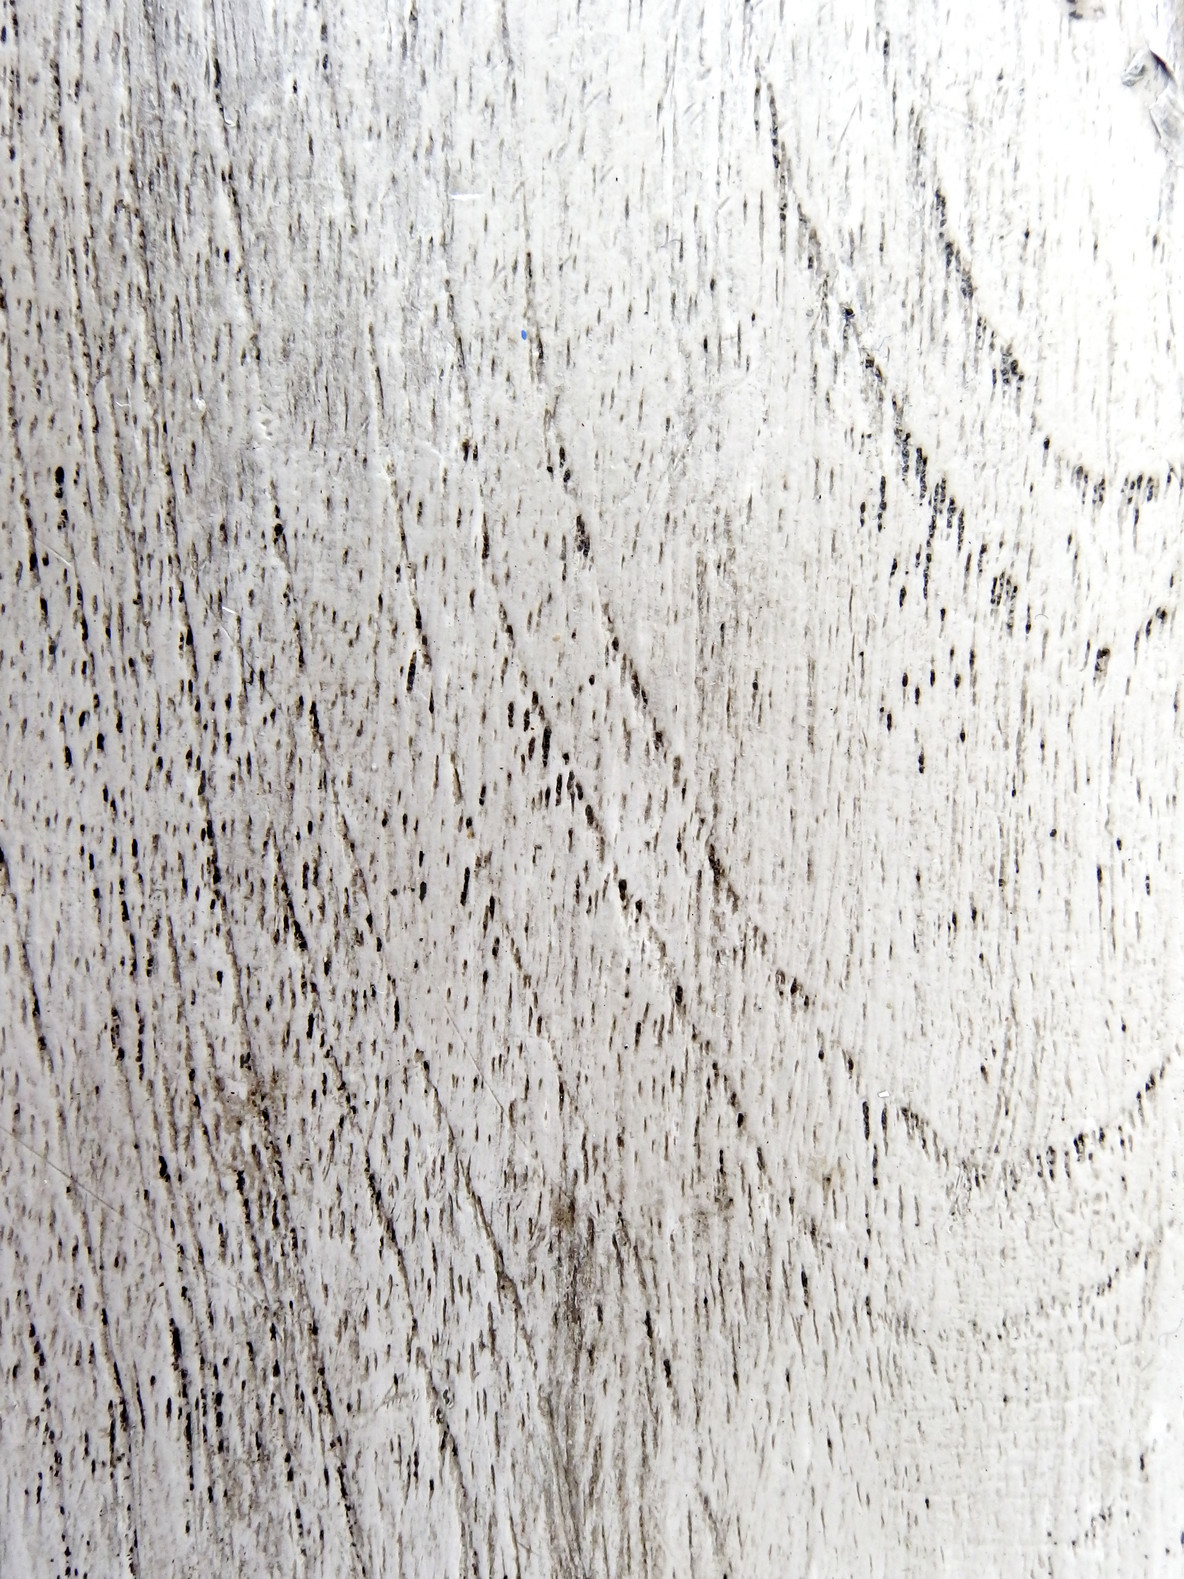 White Wood background  Wooden bo